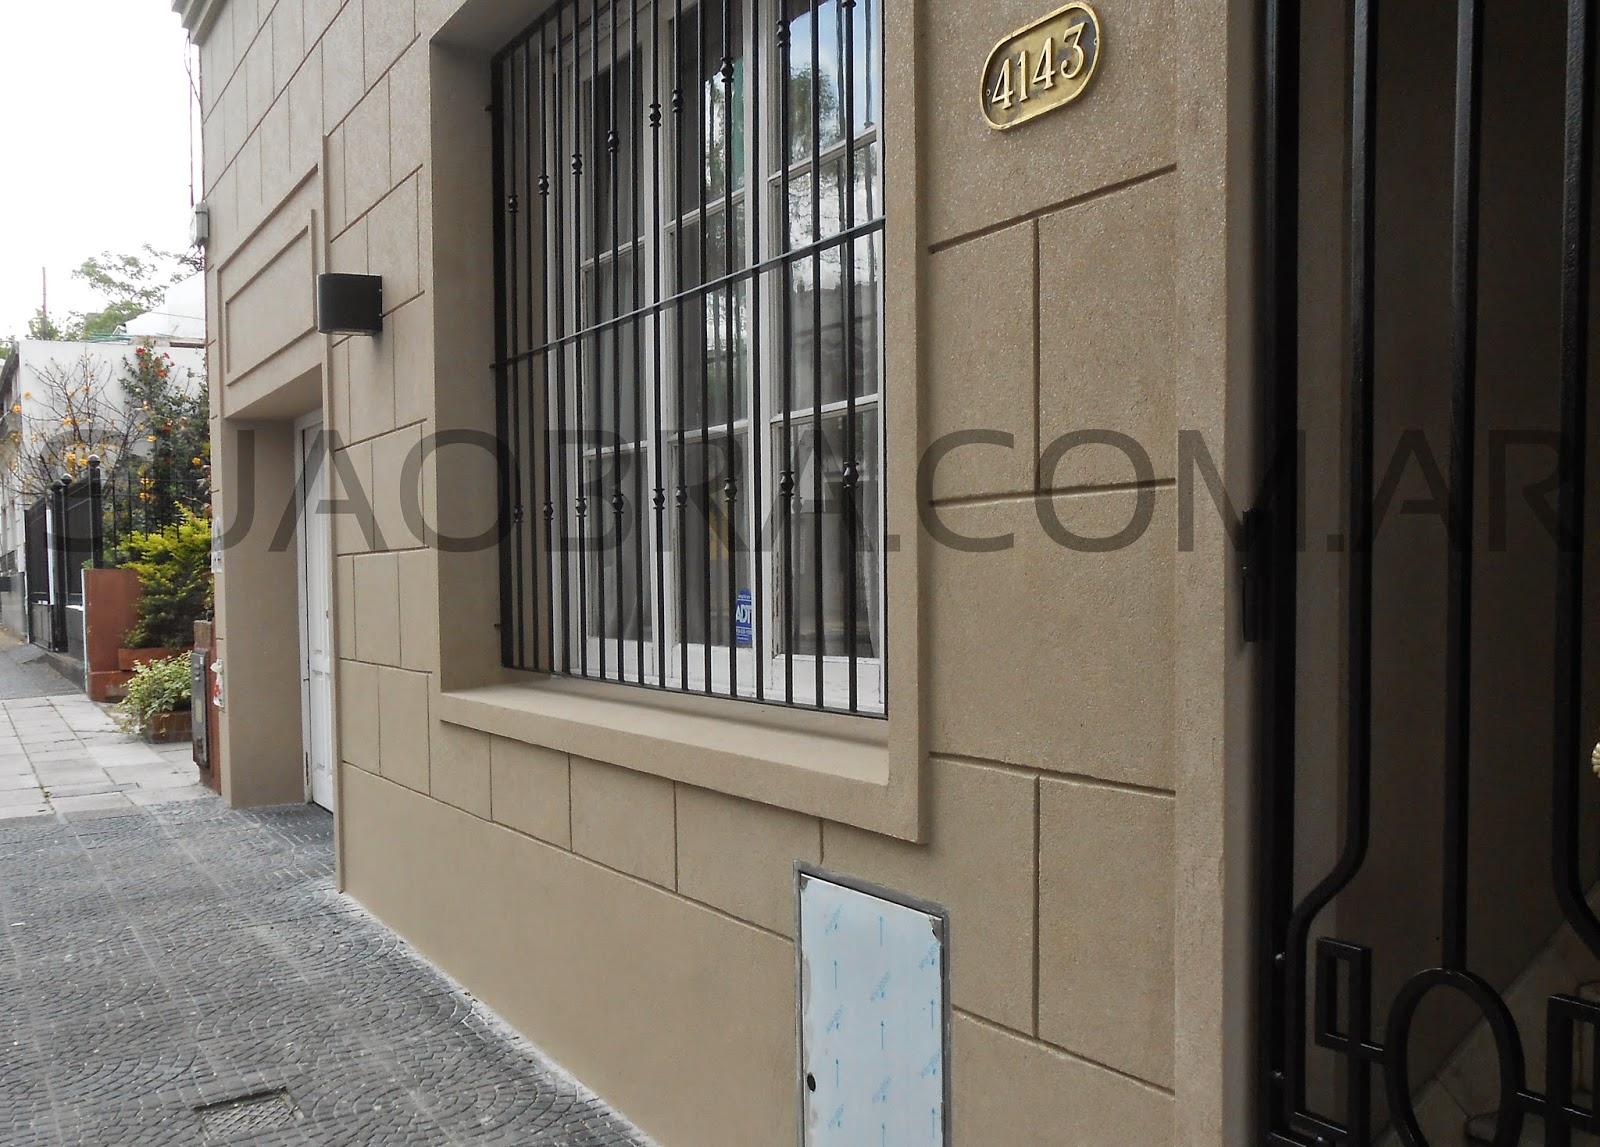 Revestimientos plasticos por suaobra com - Revestimientos para paredes exteriores en piedra ...